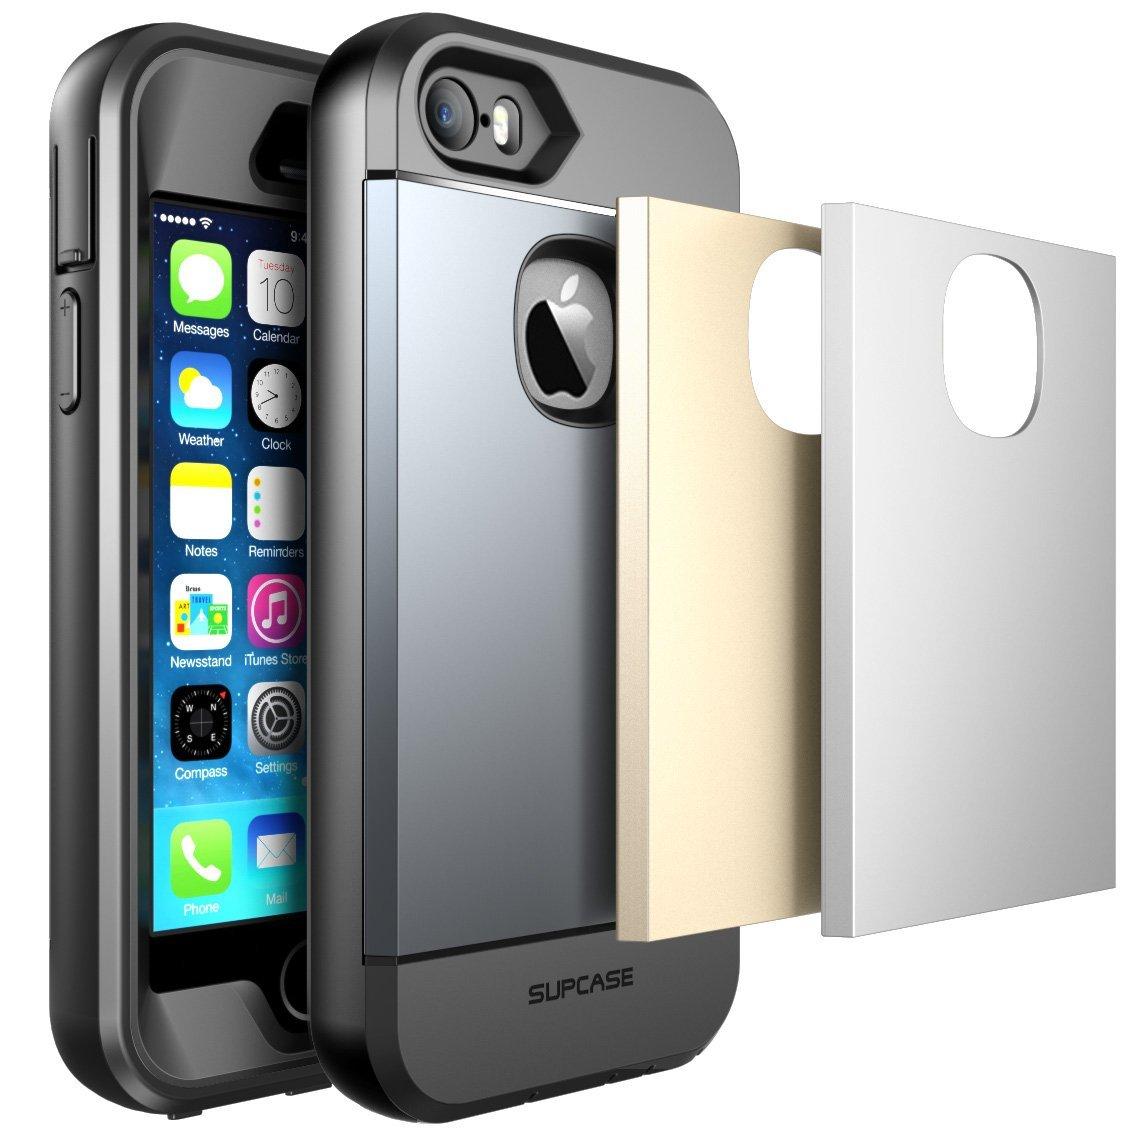 iphone cases, iphone case, iphone se case, iphone se cases, new iphone cases, small iphone cases 4 inch iphone cases, 2016 iphone cases, cheap iphone se cases, iphone se battery cases, iphone se wallet cases